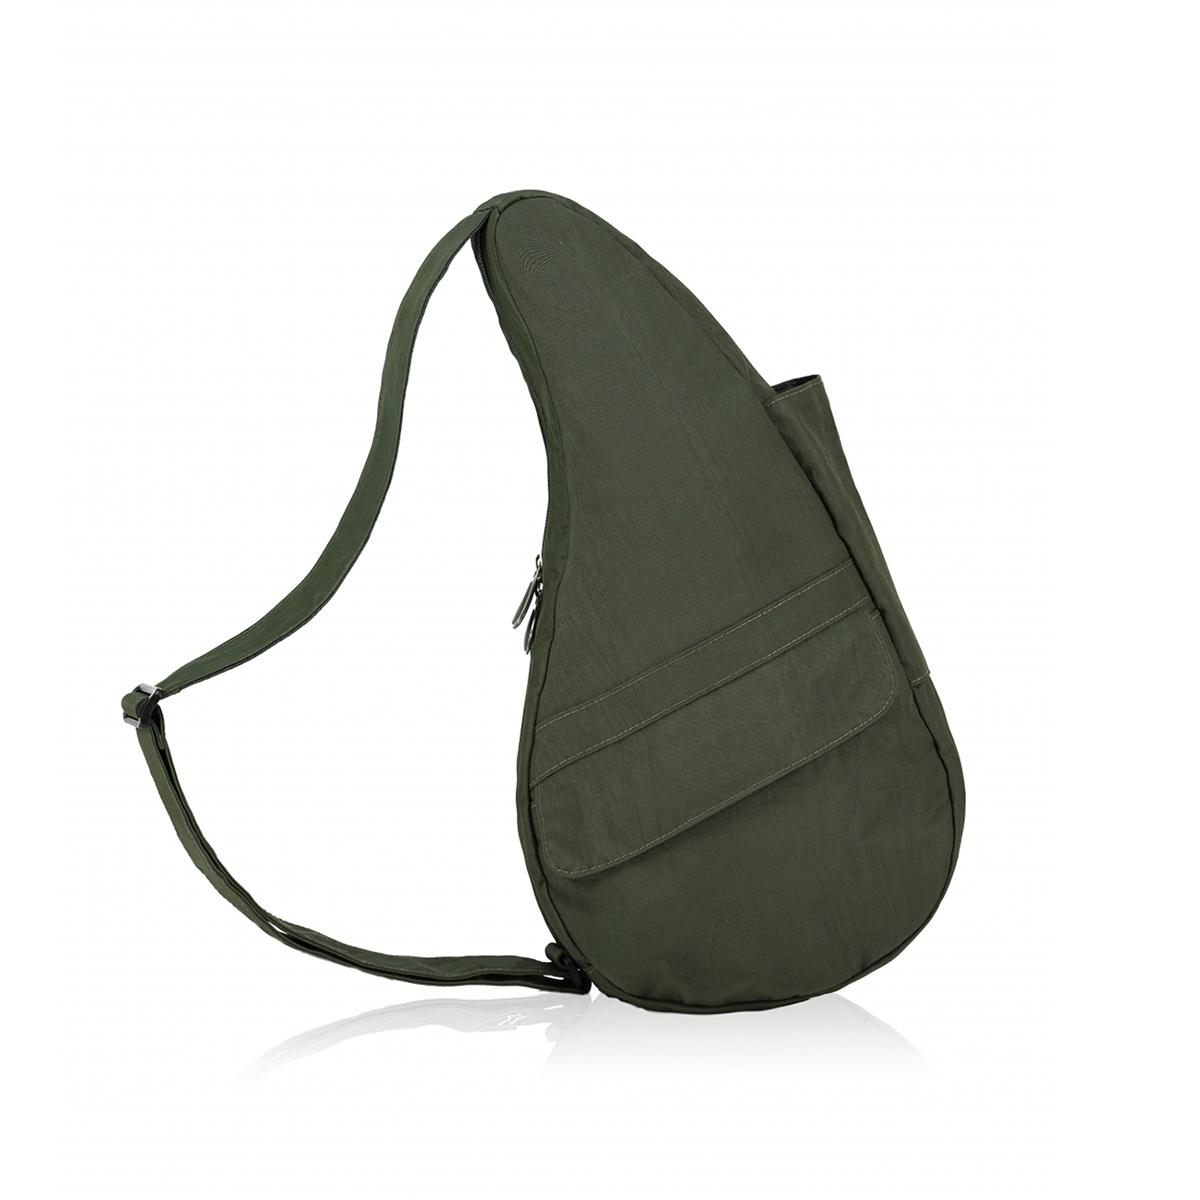 Healthy Back Bag/ヘルシーバックバッグ/ショルダーバッグ/ボディバッグ/旅行バッグ/軽量/レディース/メンズ 《限定ポーチ付》 公式ストア ヘルシーバックバッグ テクスチャードナイロン Mサイズ ディープフォレスト